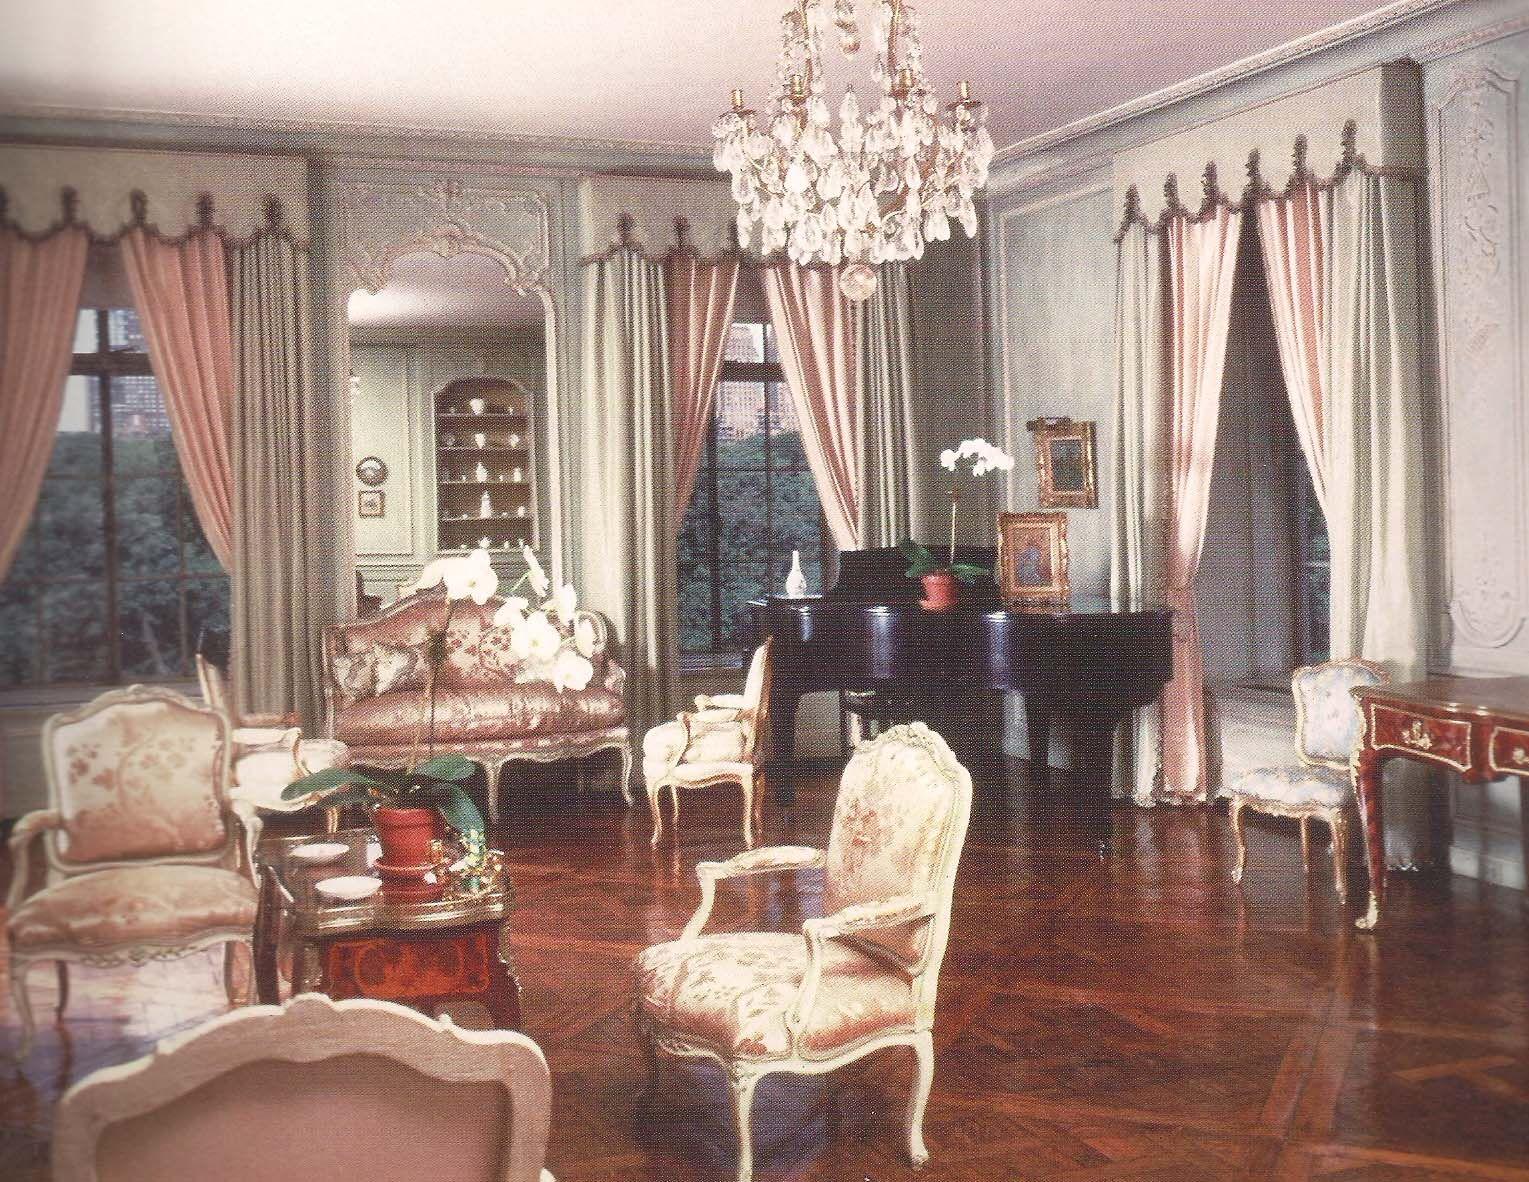 The Furnishings Mr Mrs Charles Allen Jr Salon Photo By